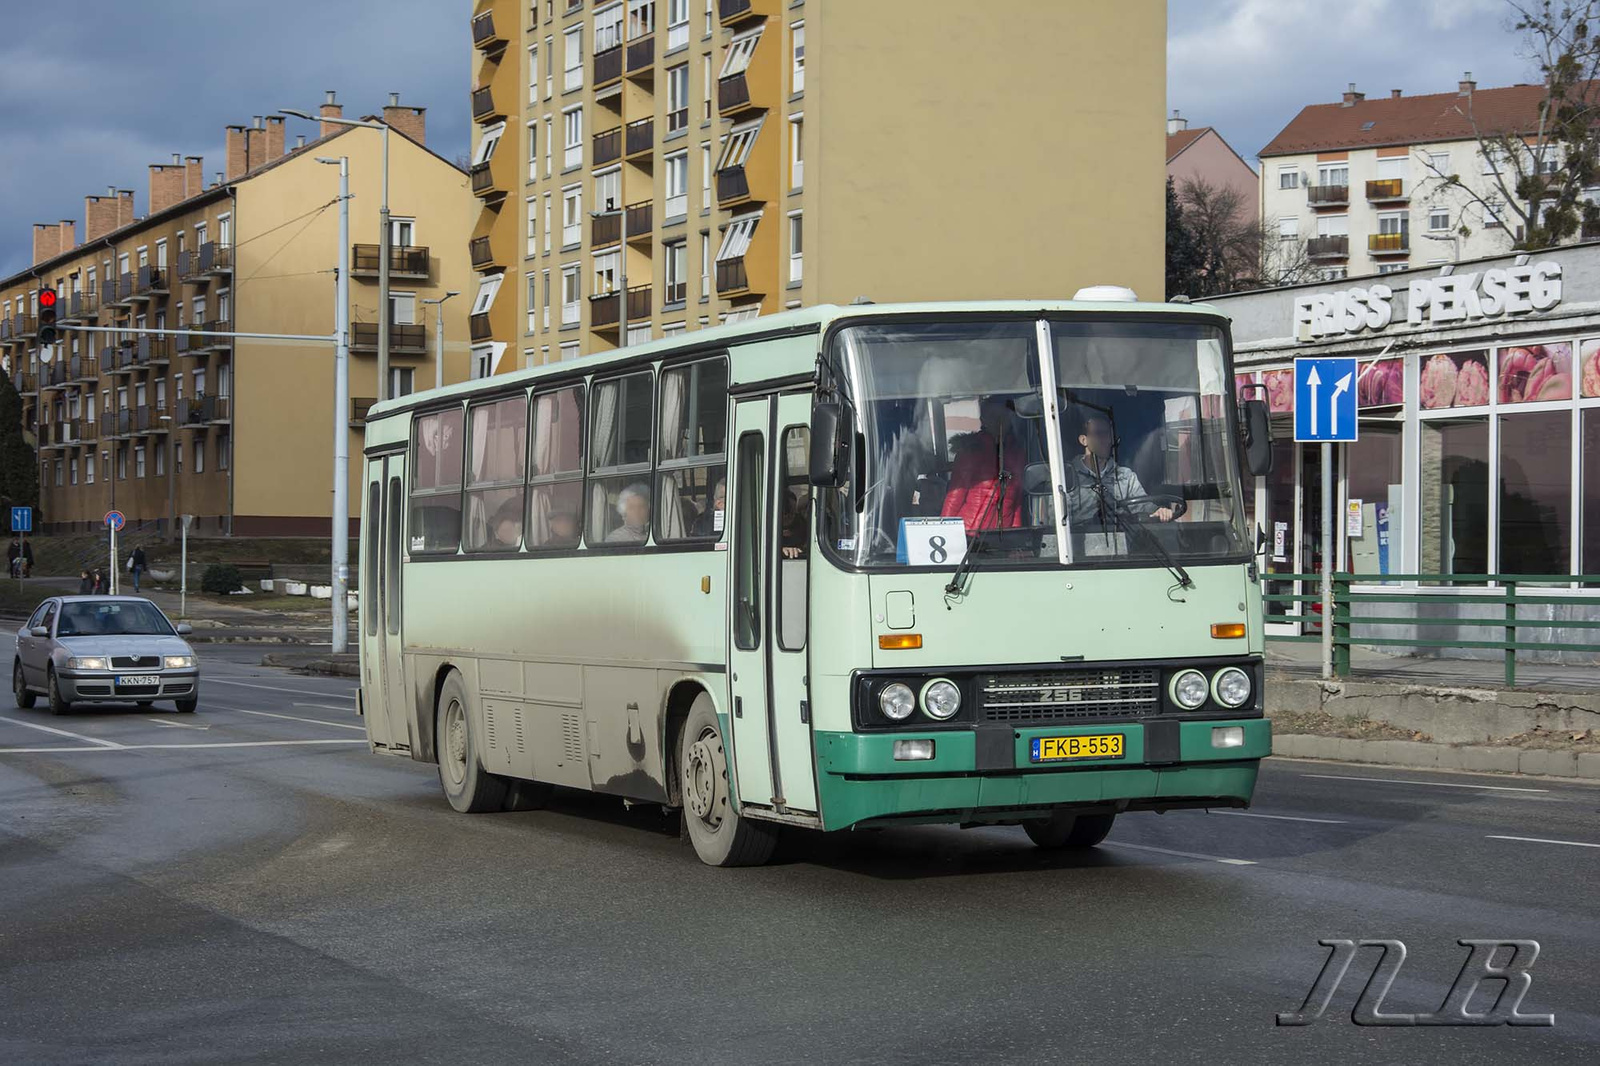 fkb-553.jpg